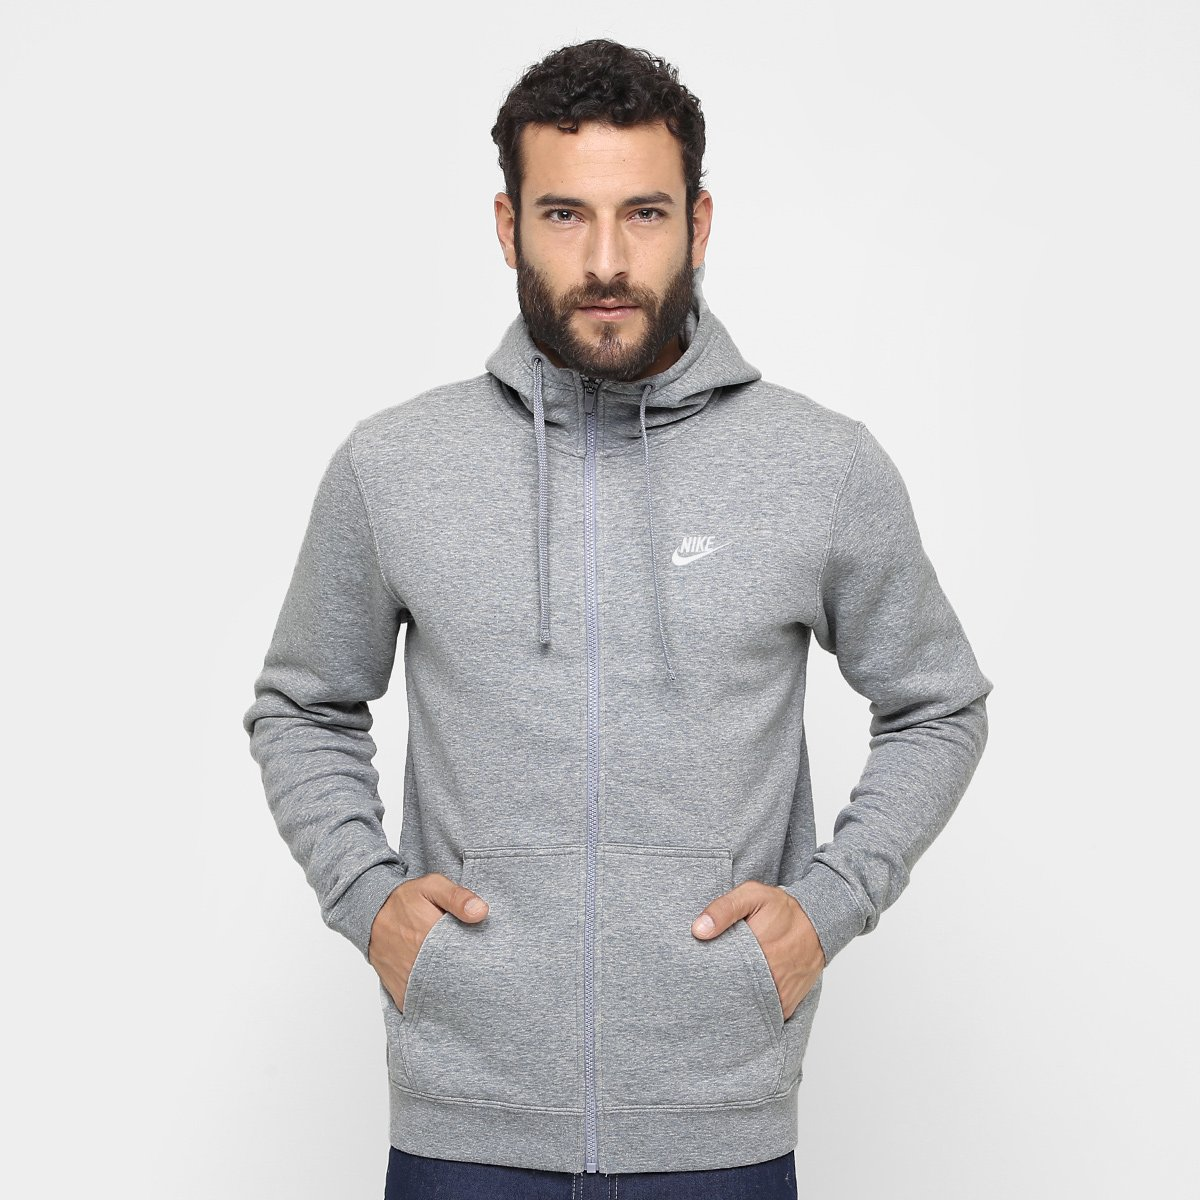 41967788d0b Moletom Nike Nsw Hoodie Fz Flc Club Masculino - Cinza - Compre Agora ...